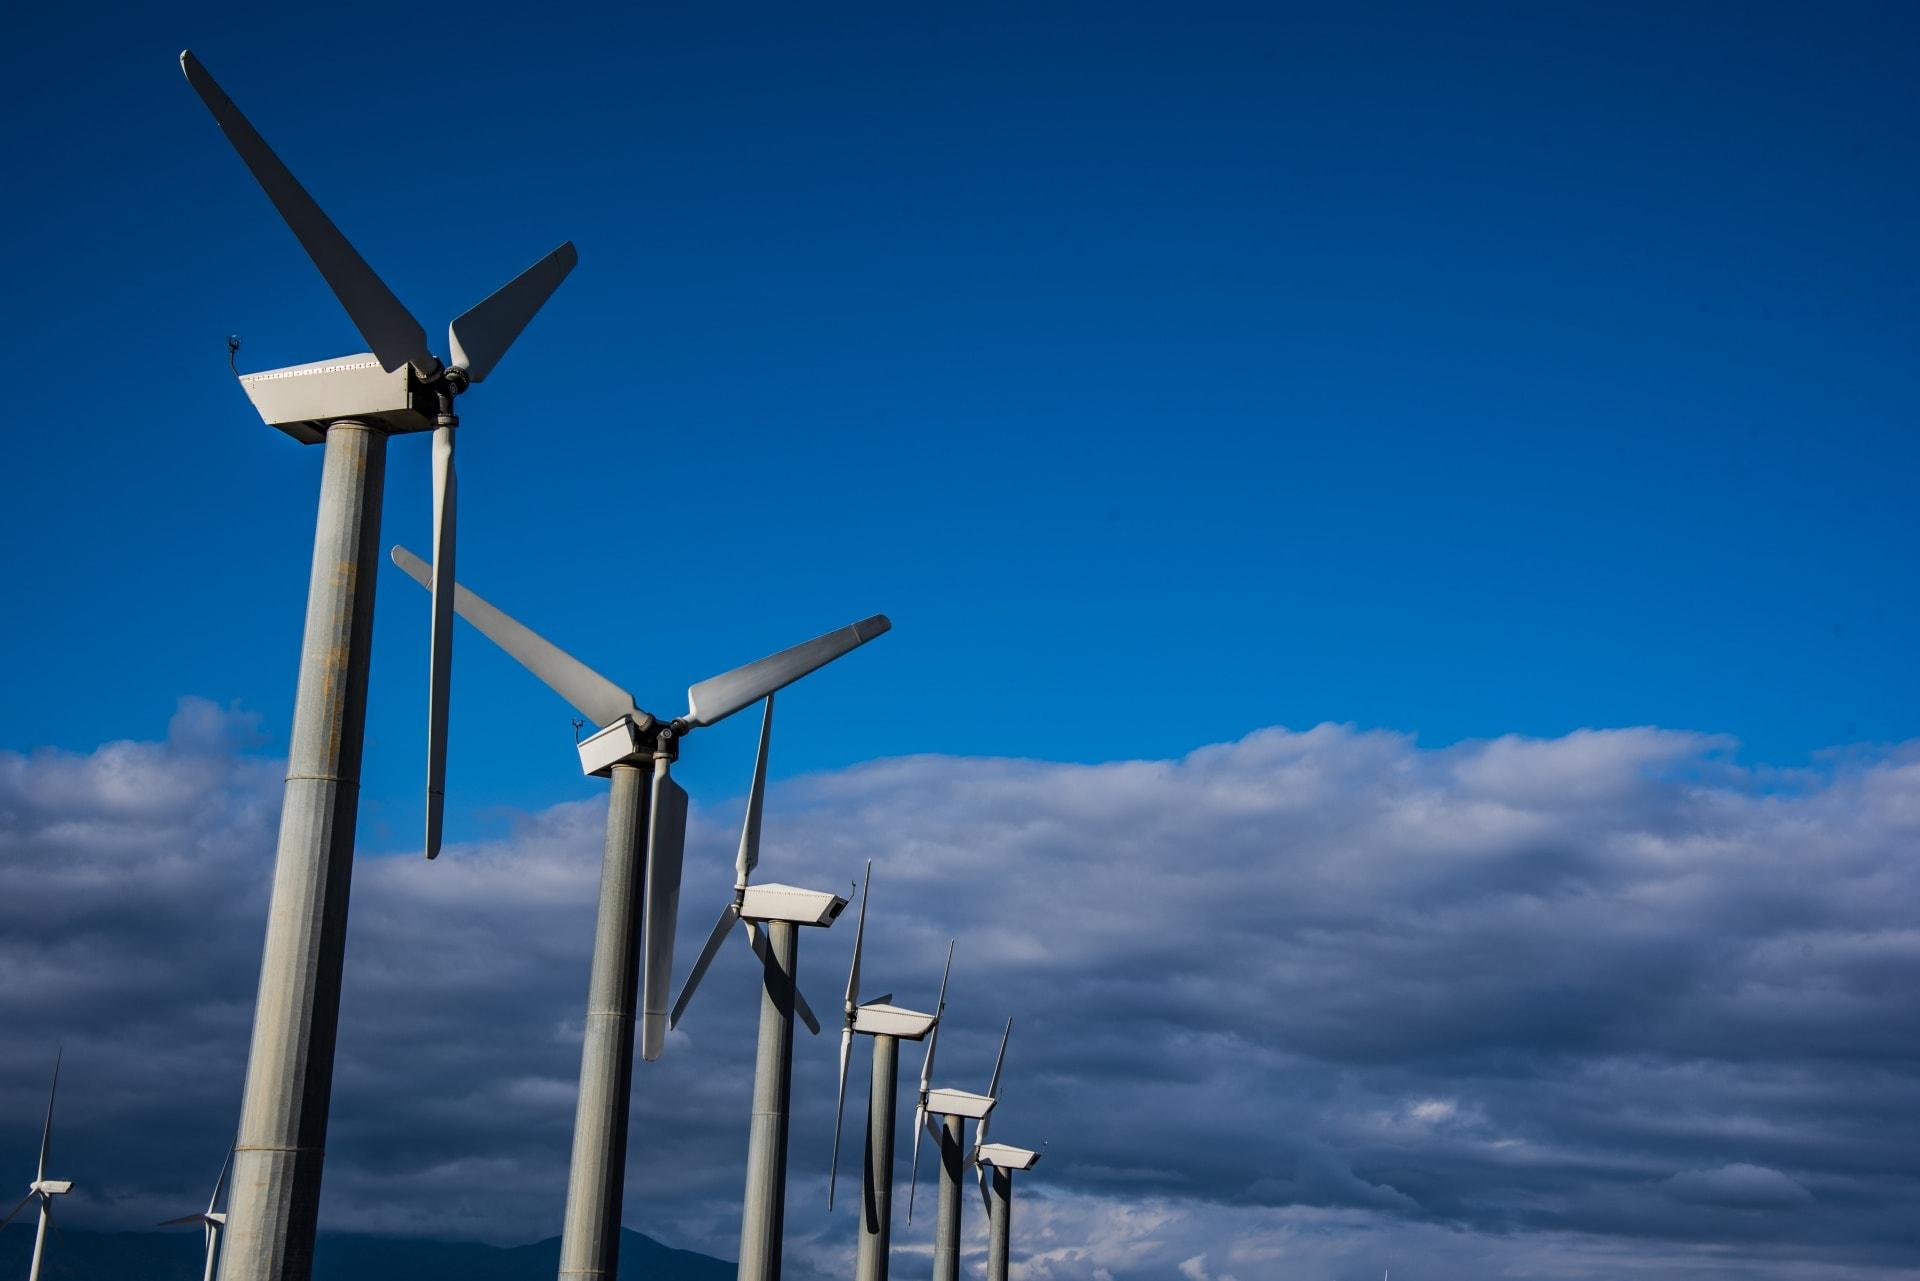 VASTAS, turbine eolice a impatto zero entro il 2040